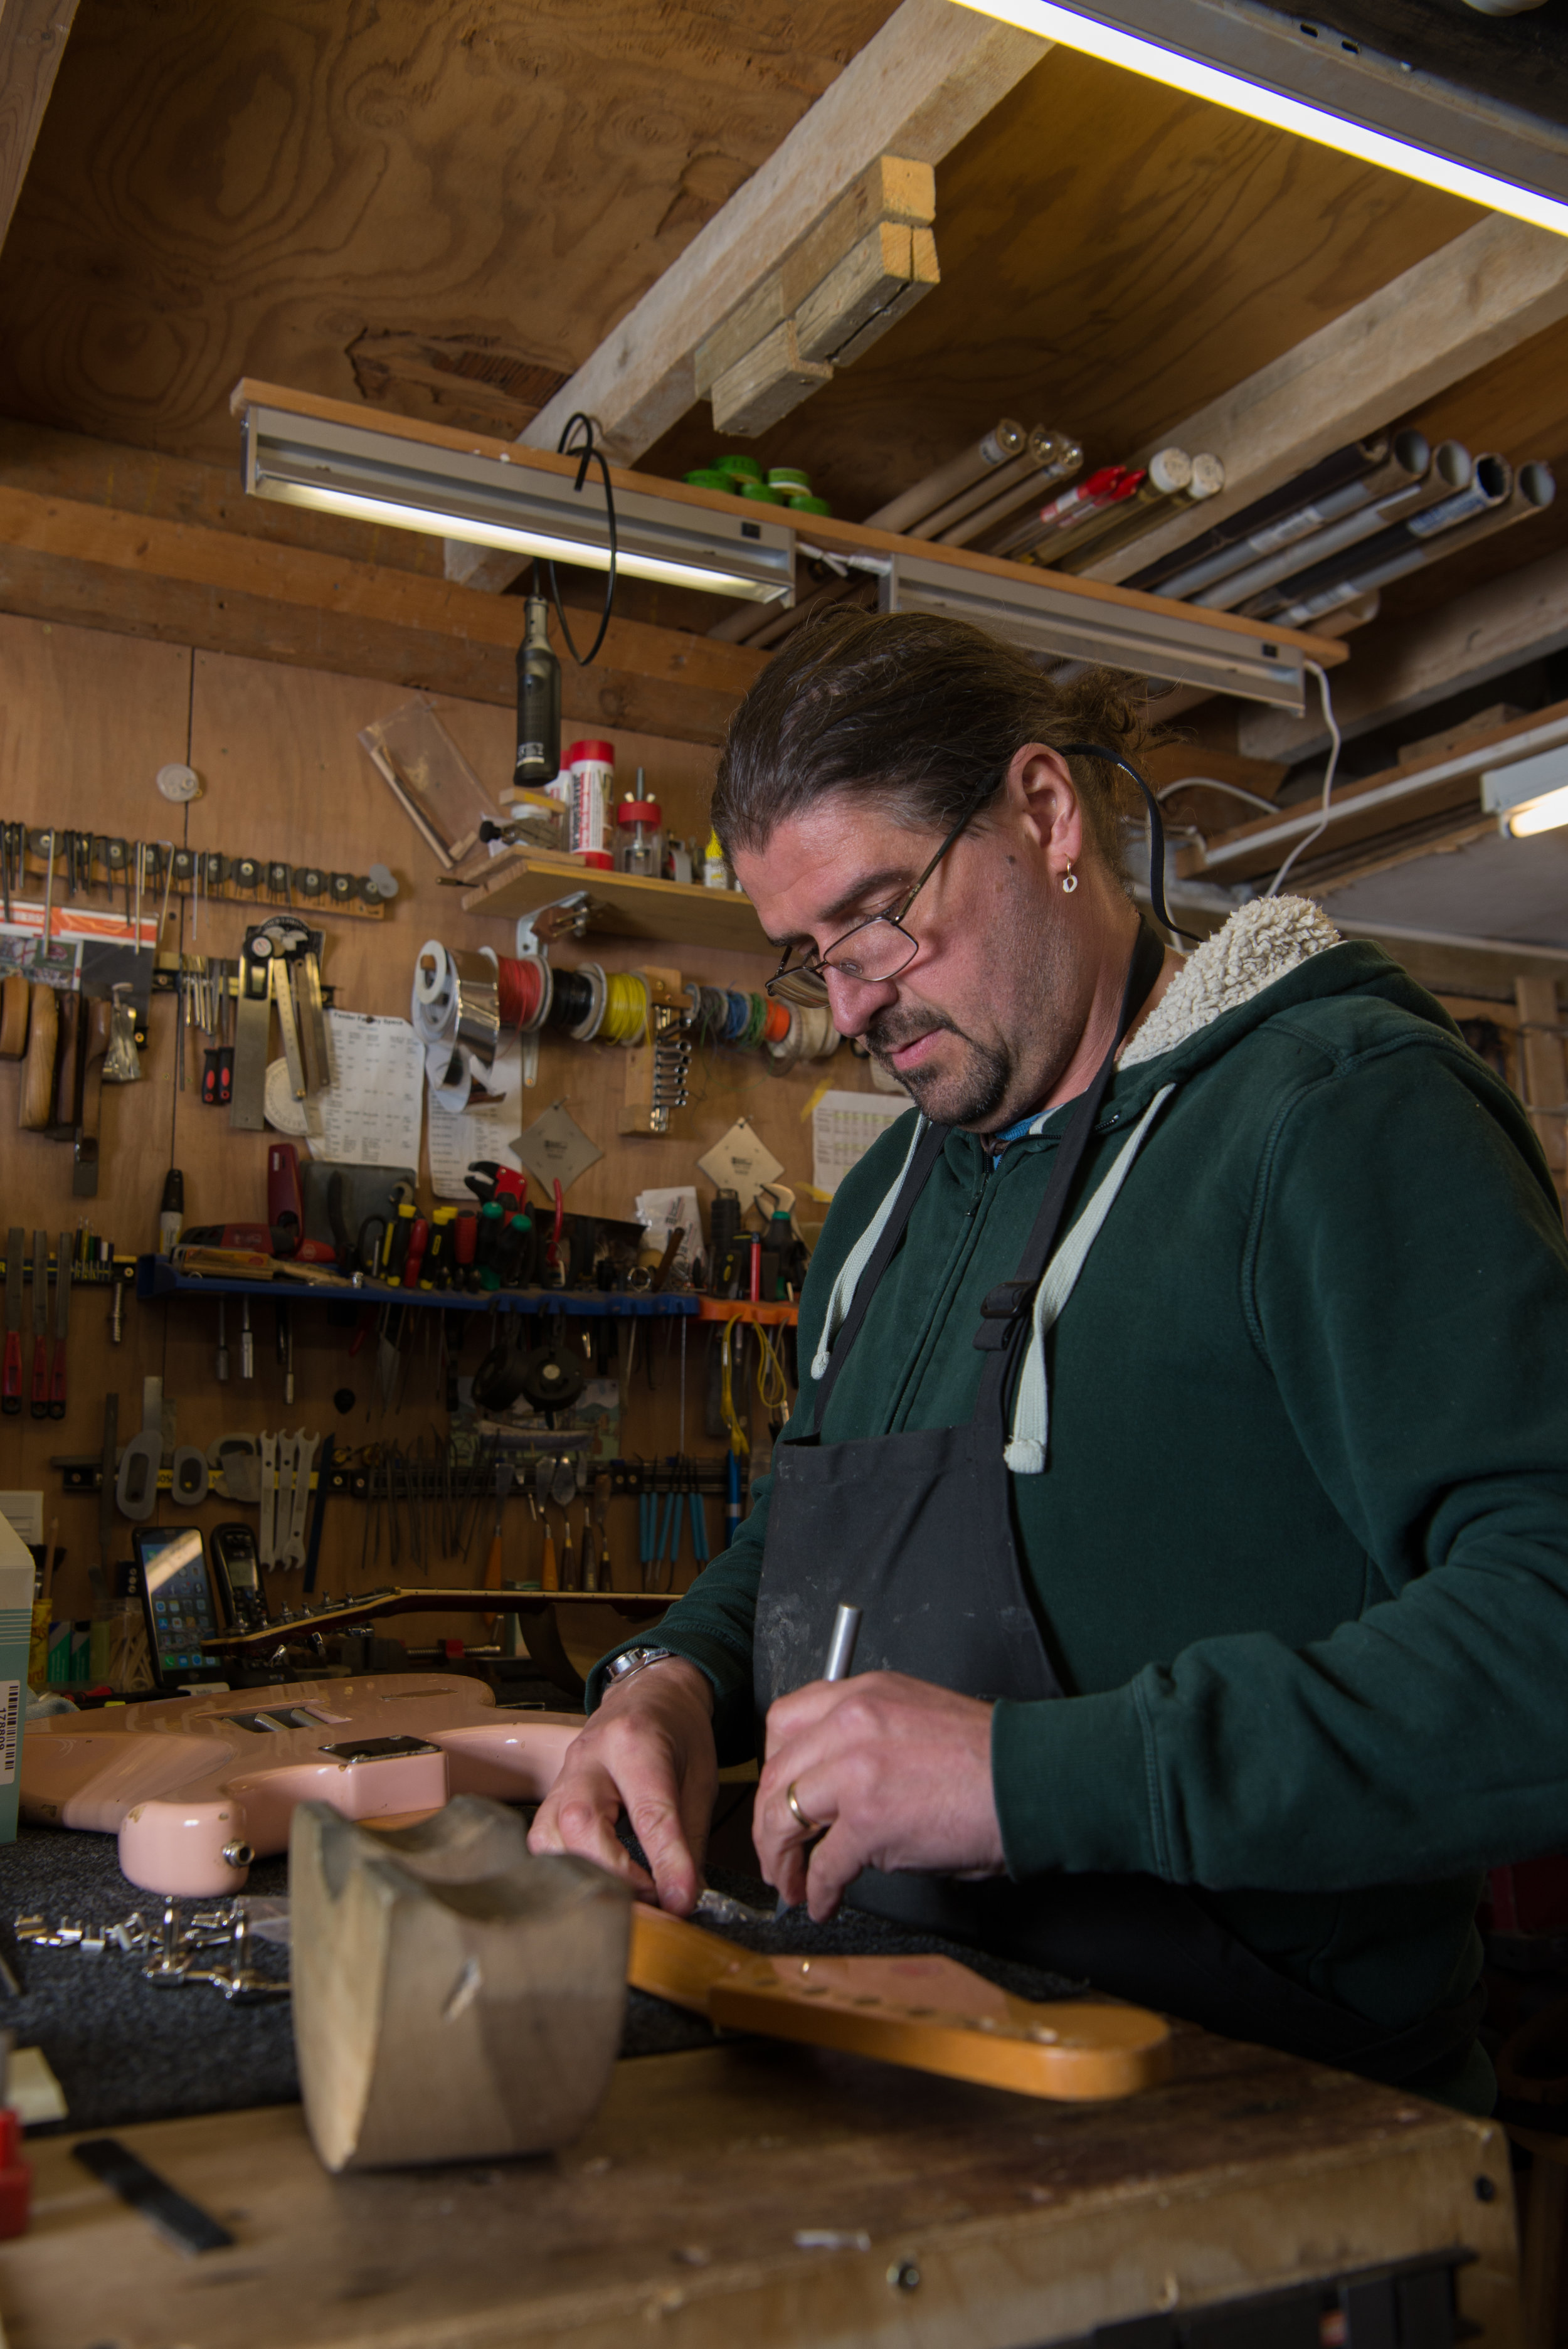 Julyan working on a stratocaster. April 2018, Penzance, UK.